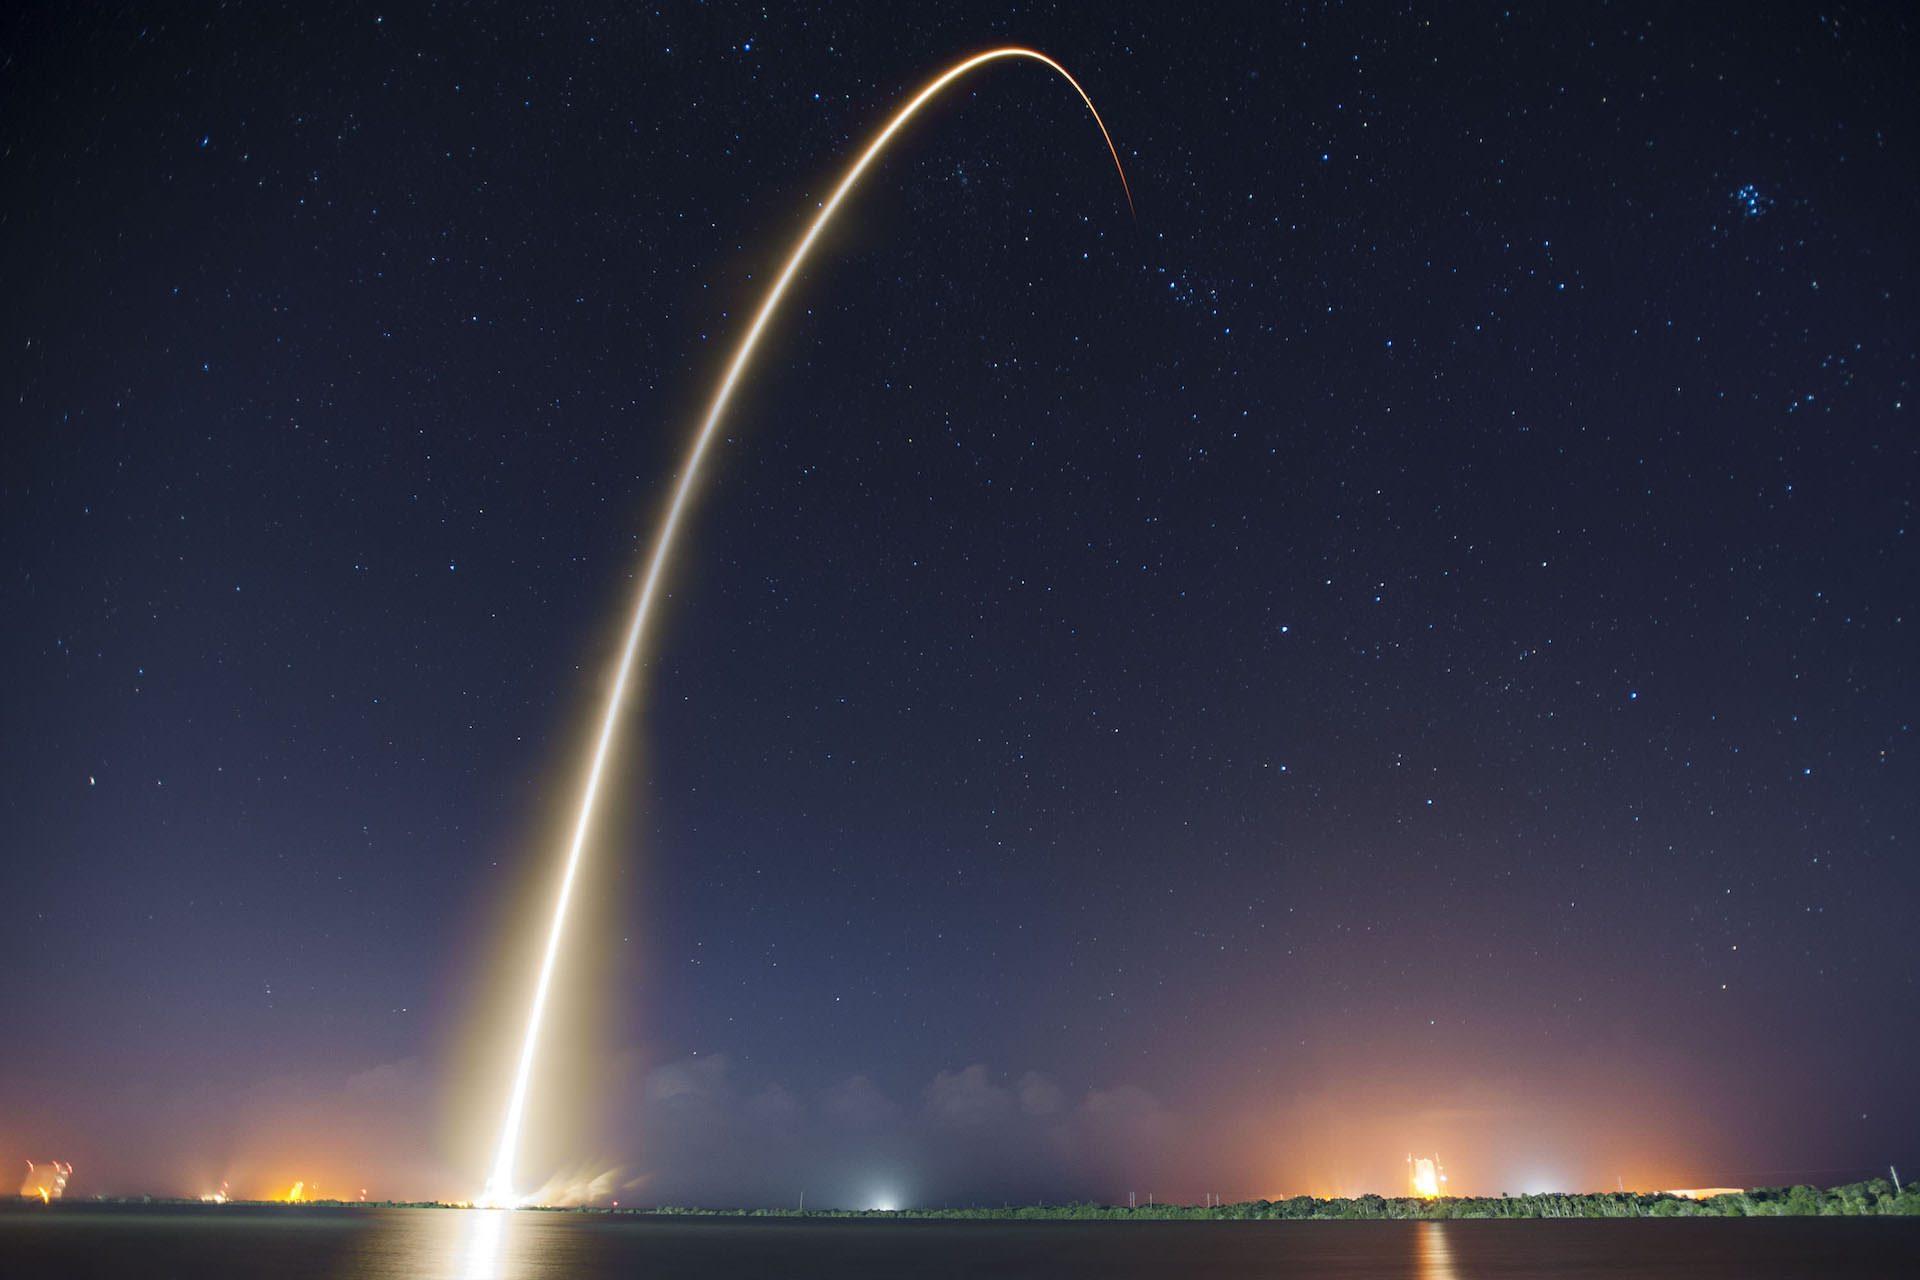 cabo cañaveral, estación espacial, nasa, ロケット, despegue - HD の壁紙 - 教授-falken.com